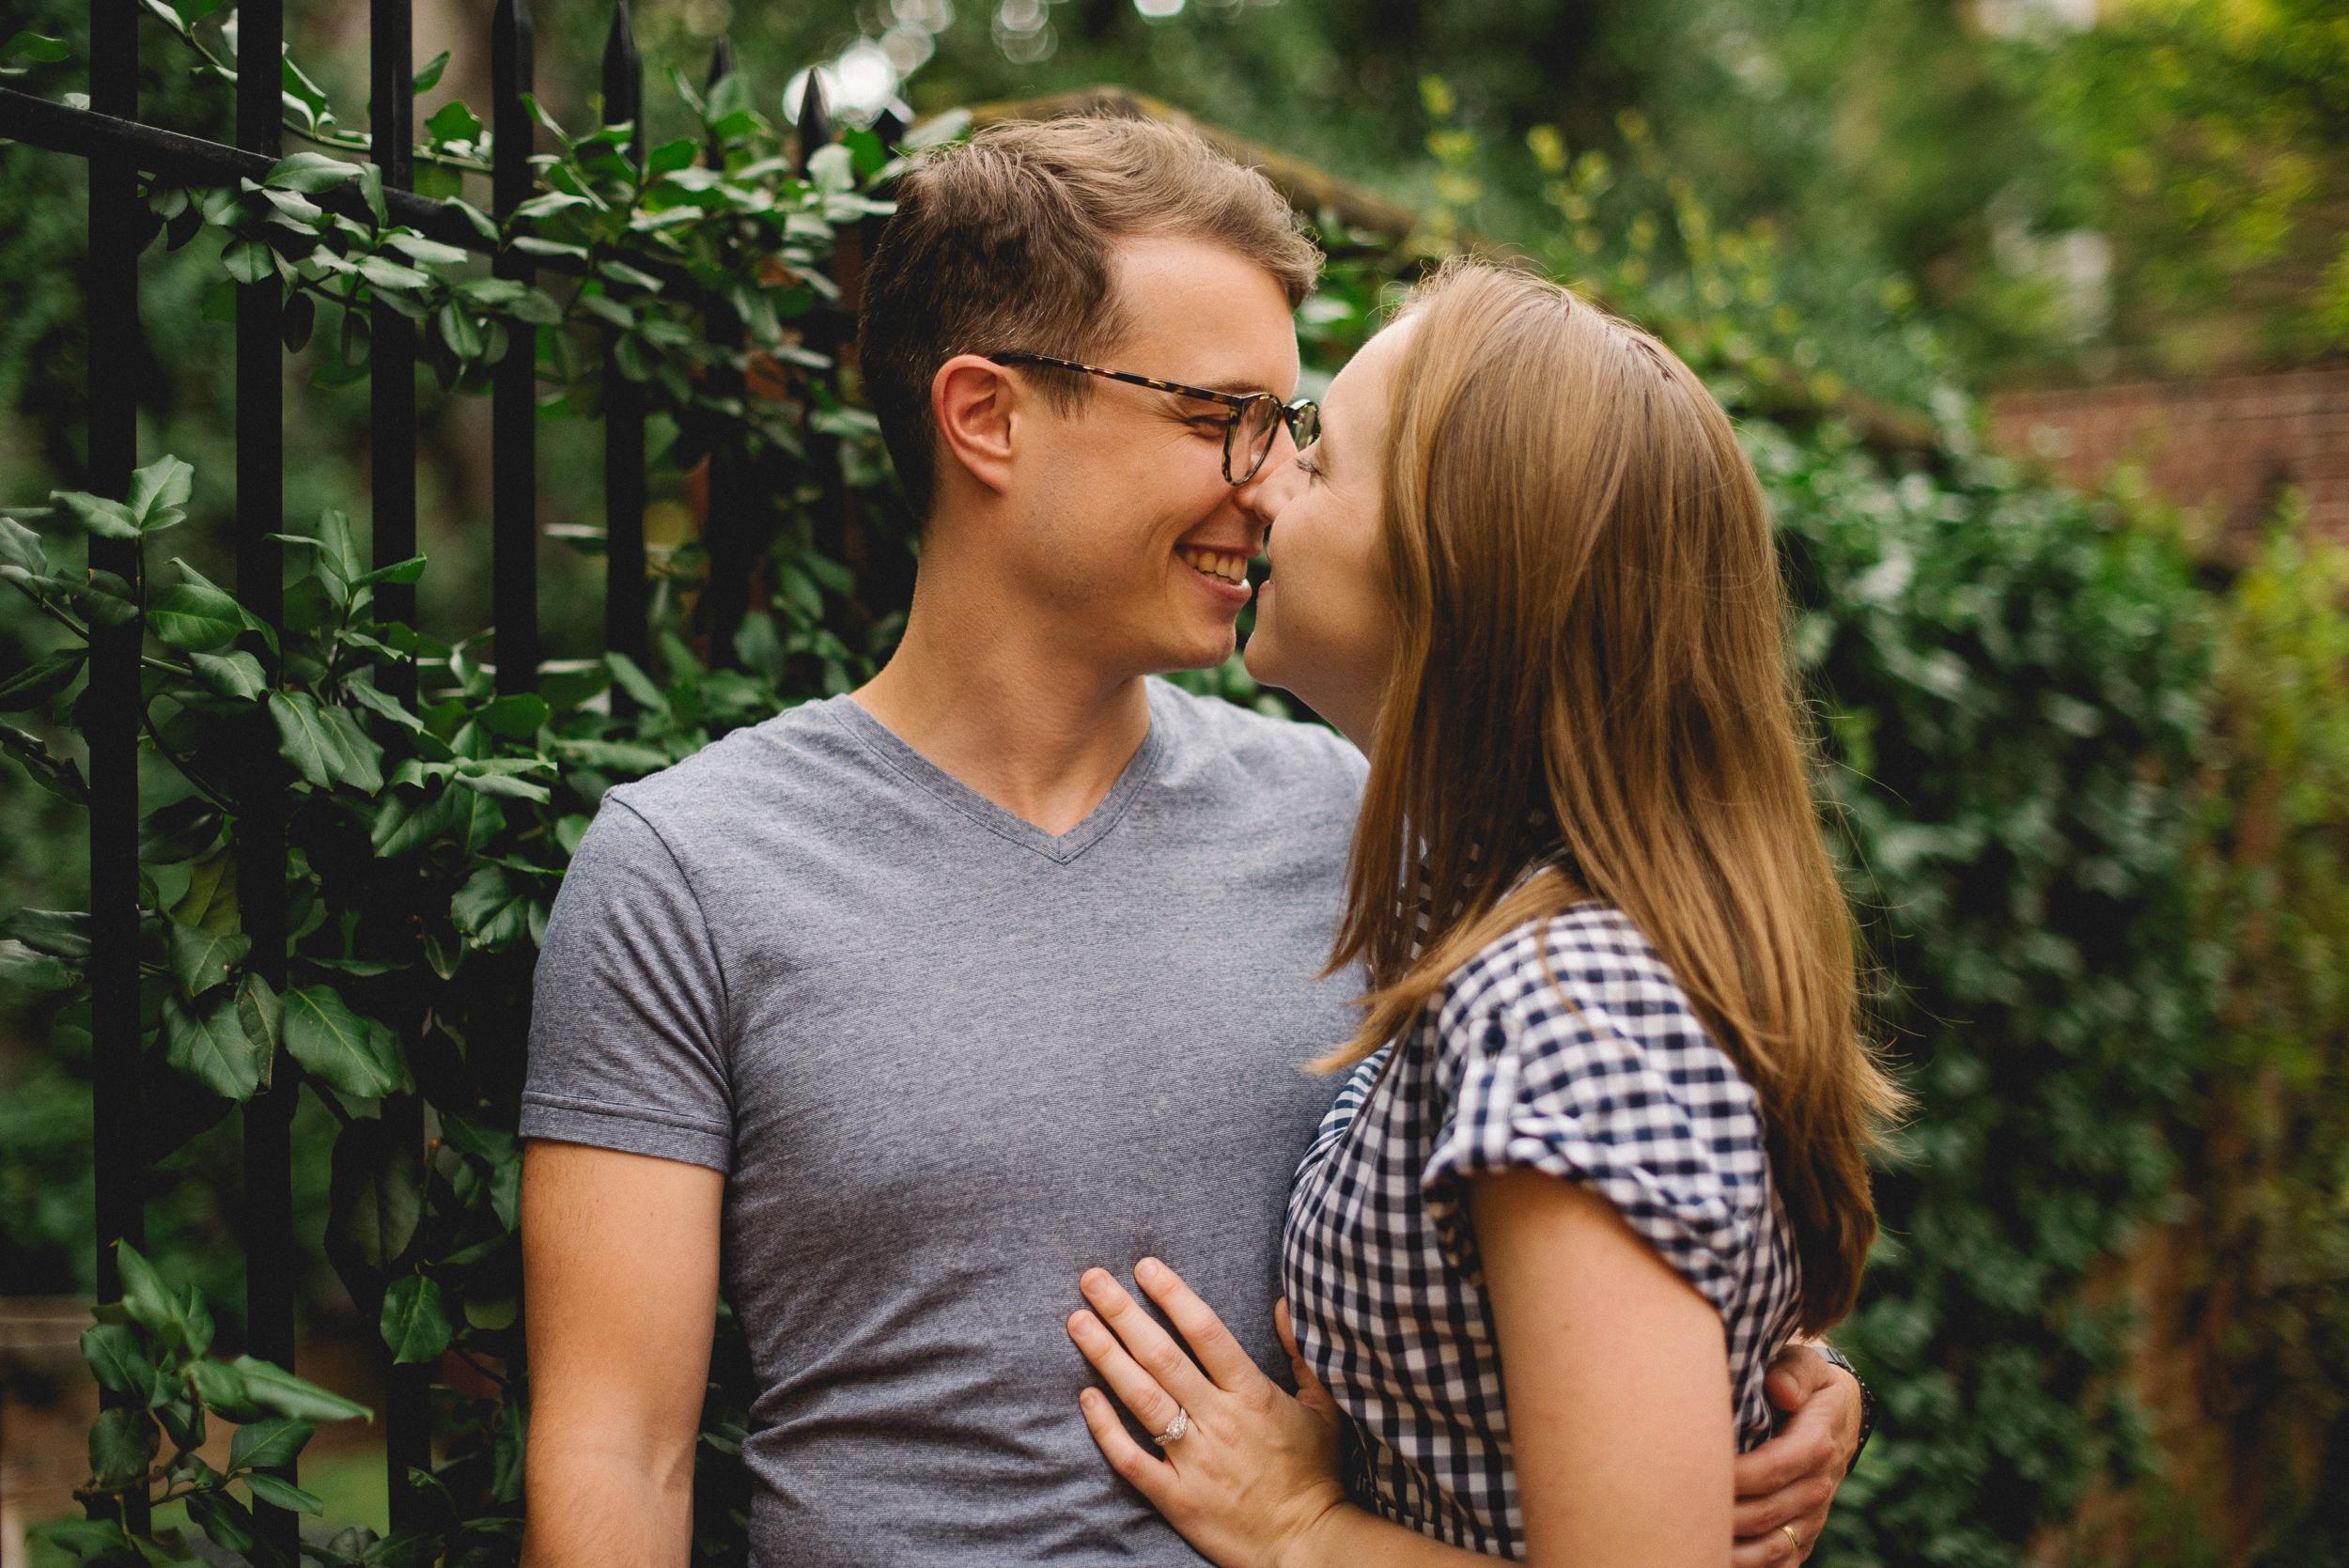 Peaberry-Photography-Society-Hill-Philadelphia-Pennsylvania-Newlyweds-Just-Married-033.jpg